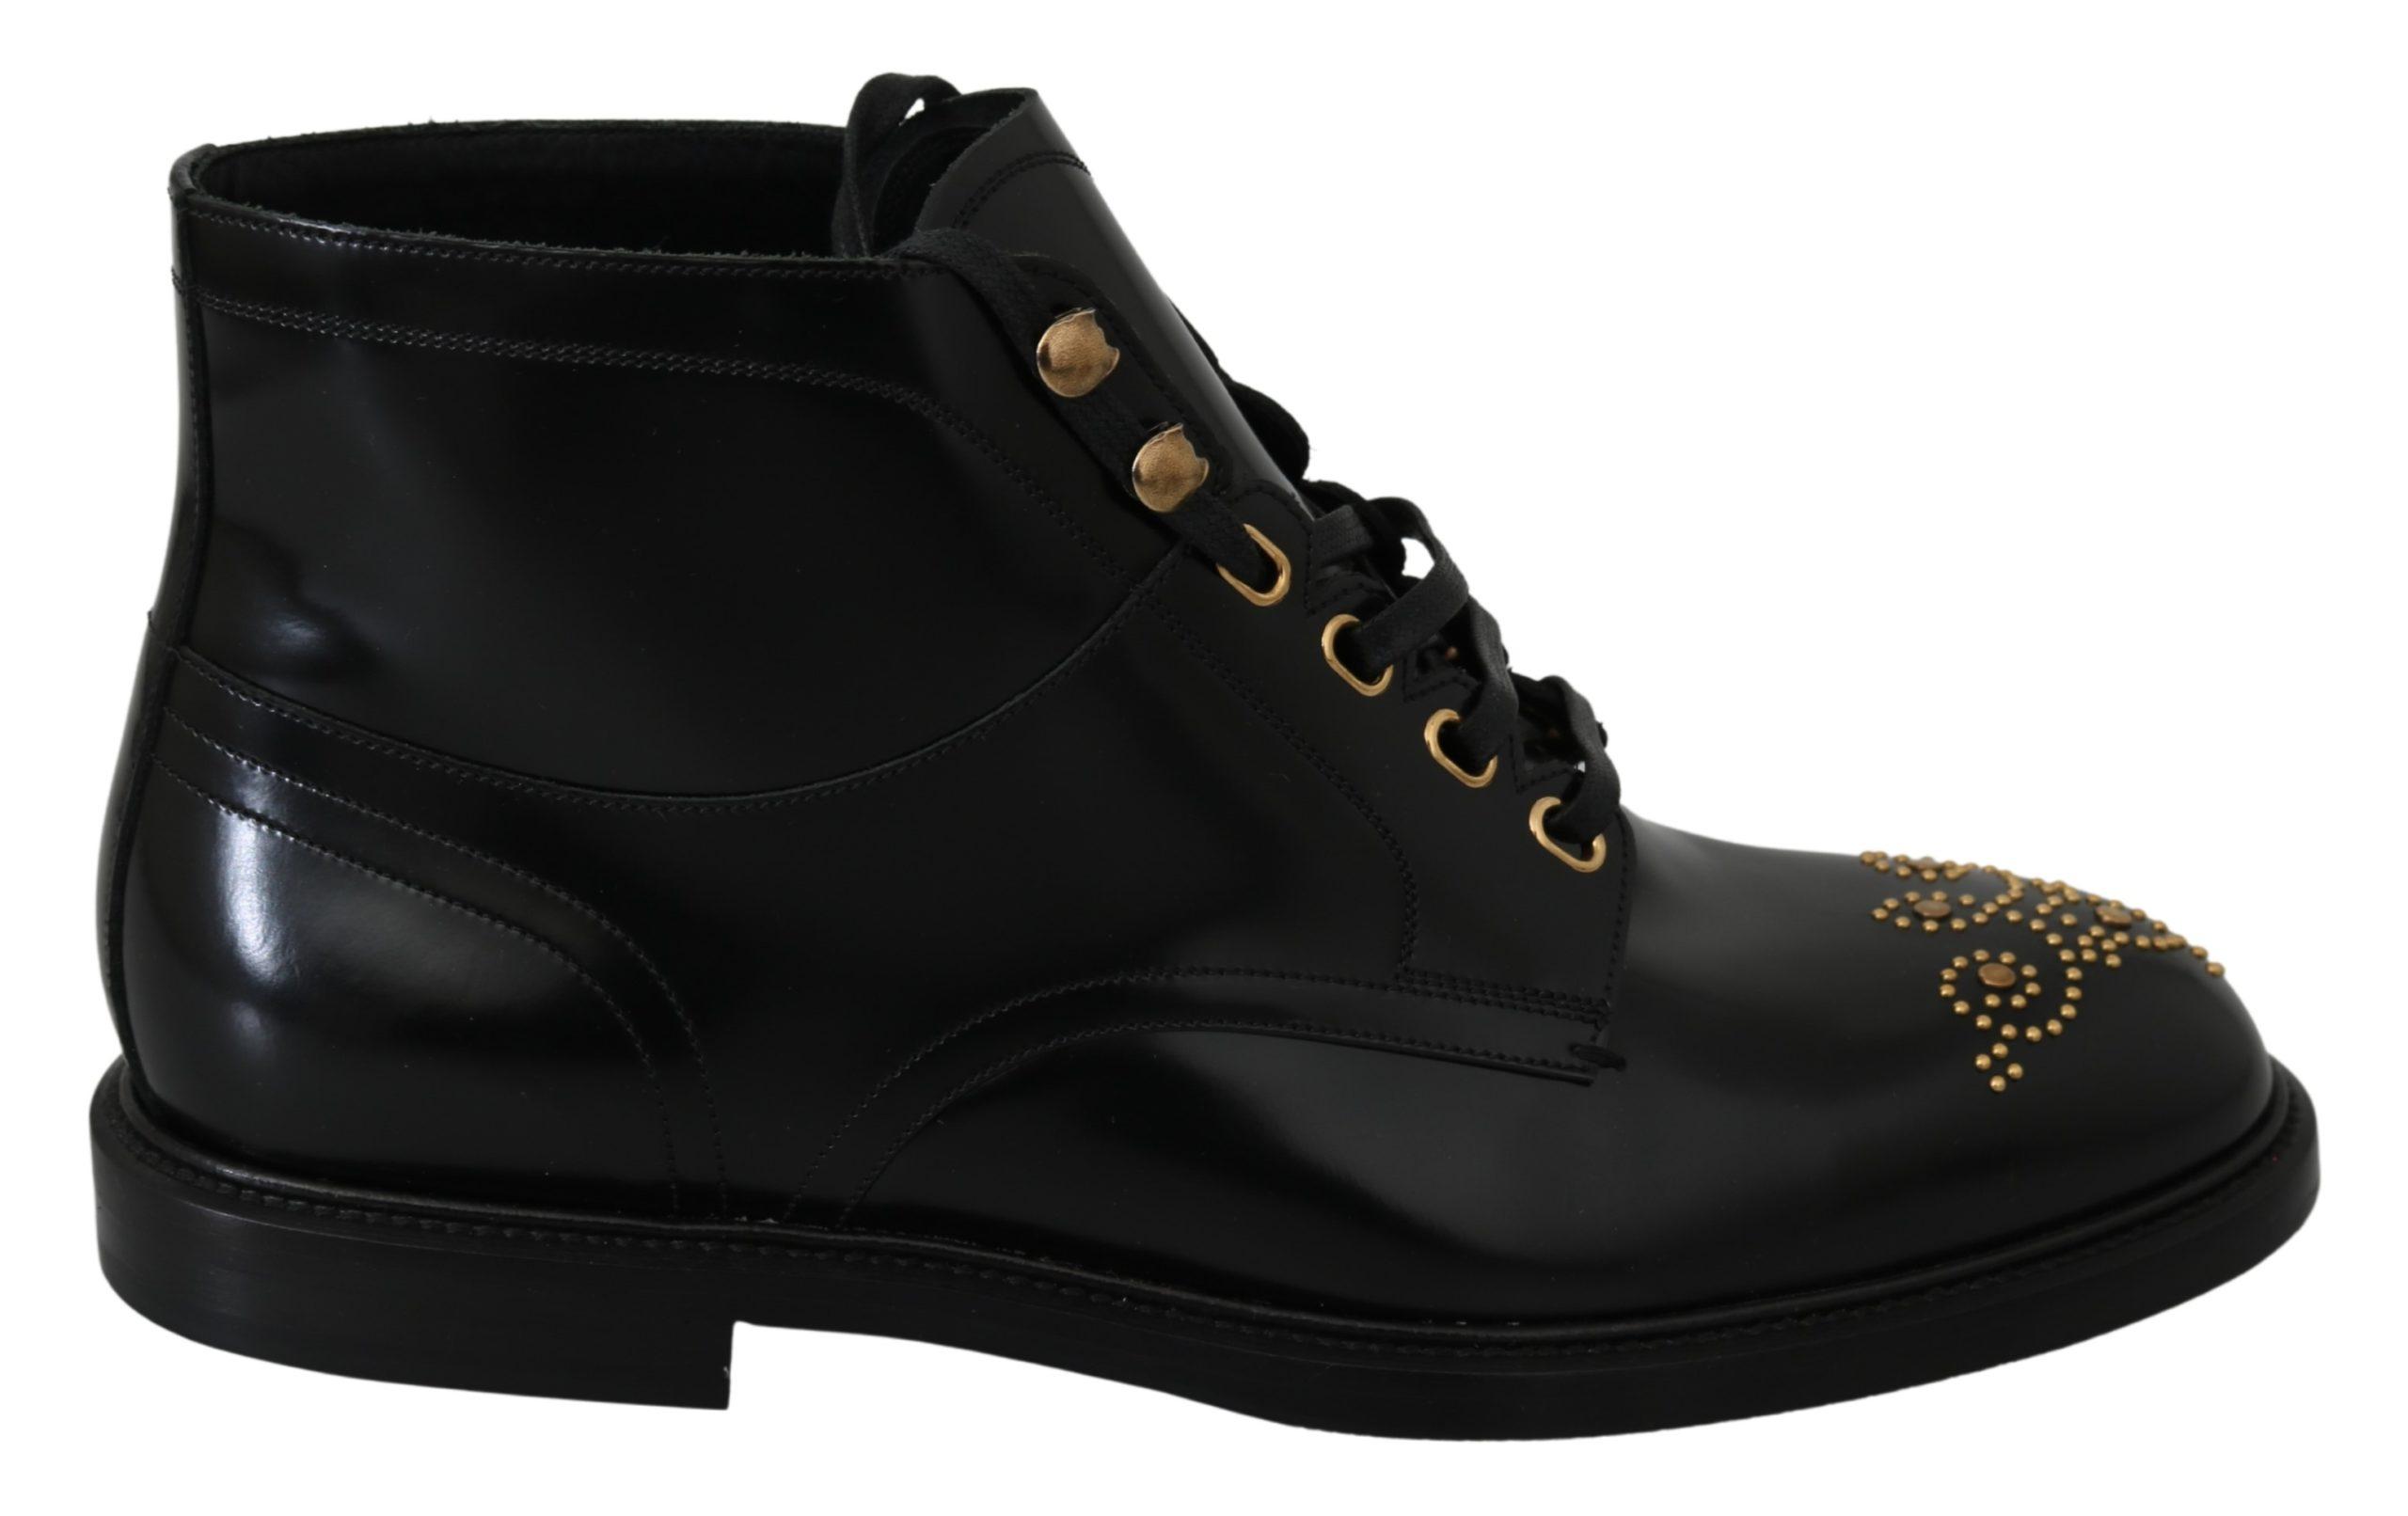 Dolce & Gabbana Men's Leather Lace Up Boot Black MV2821 - EU43/US10